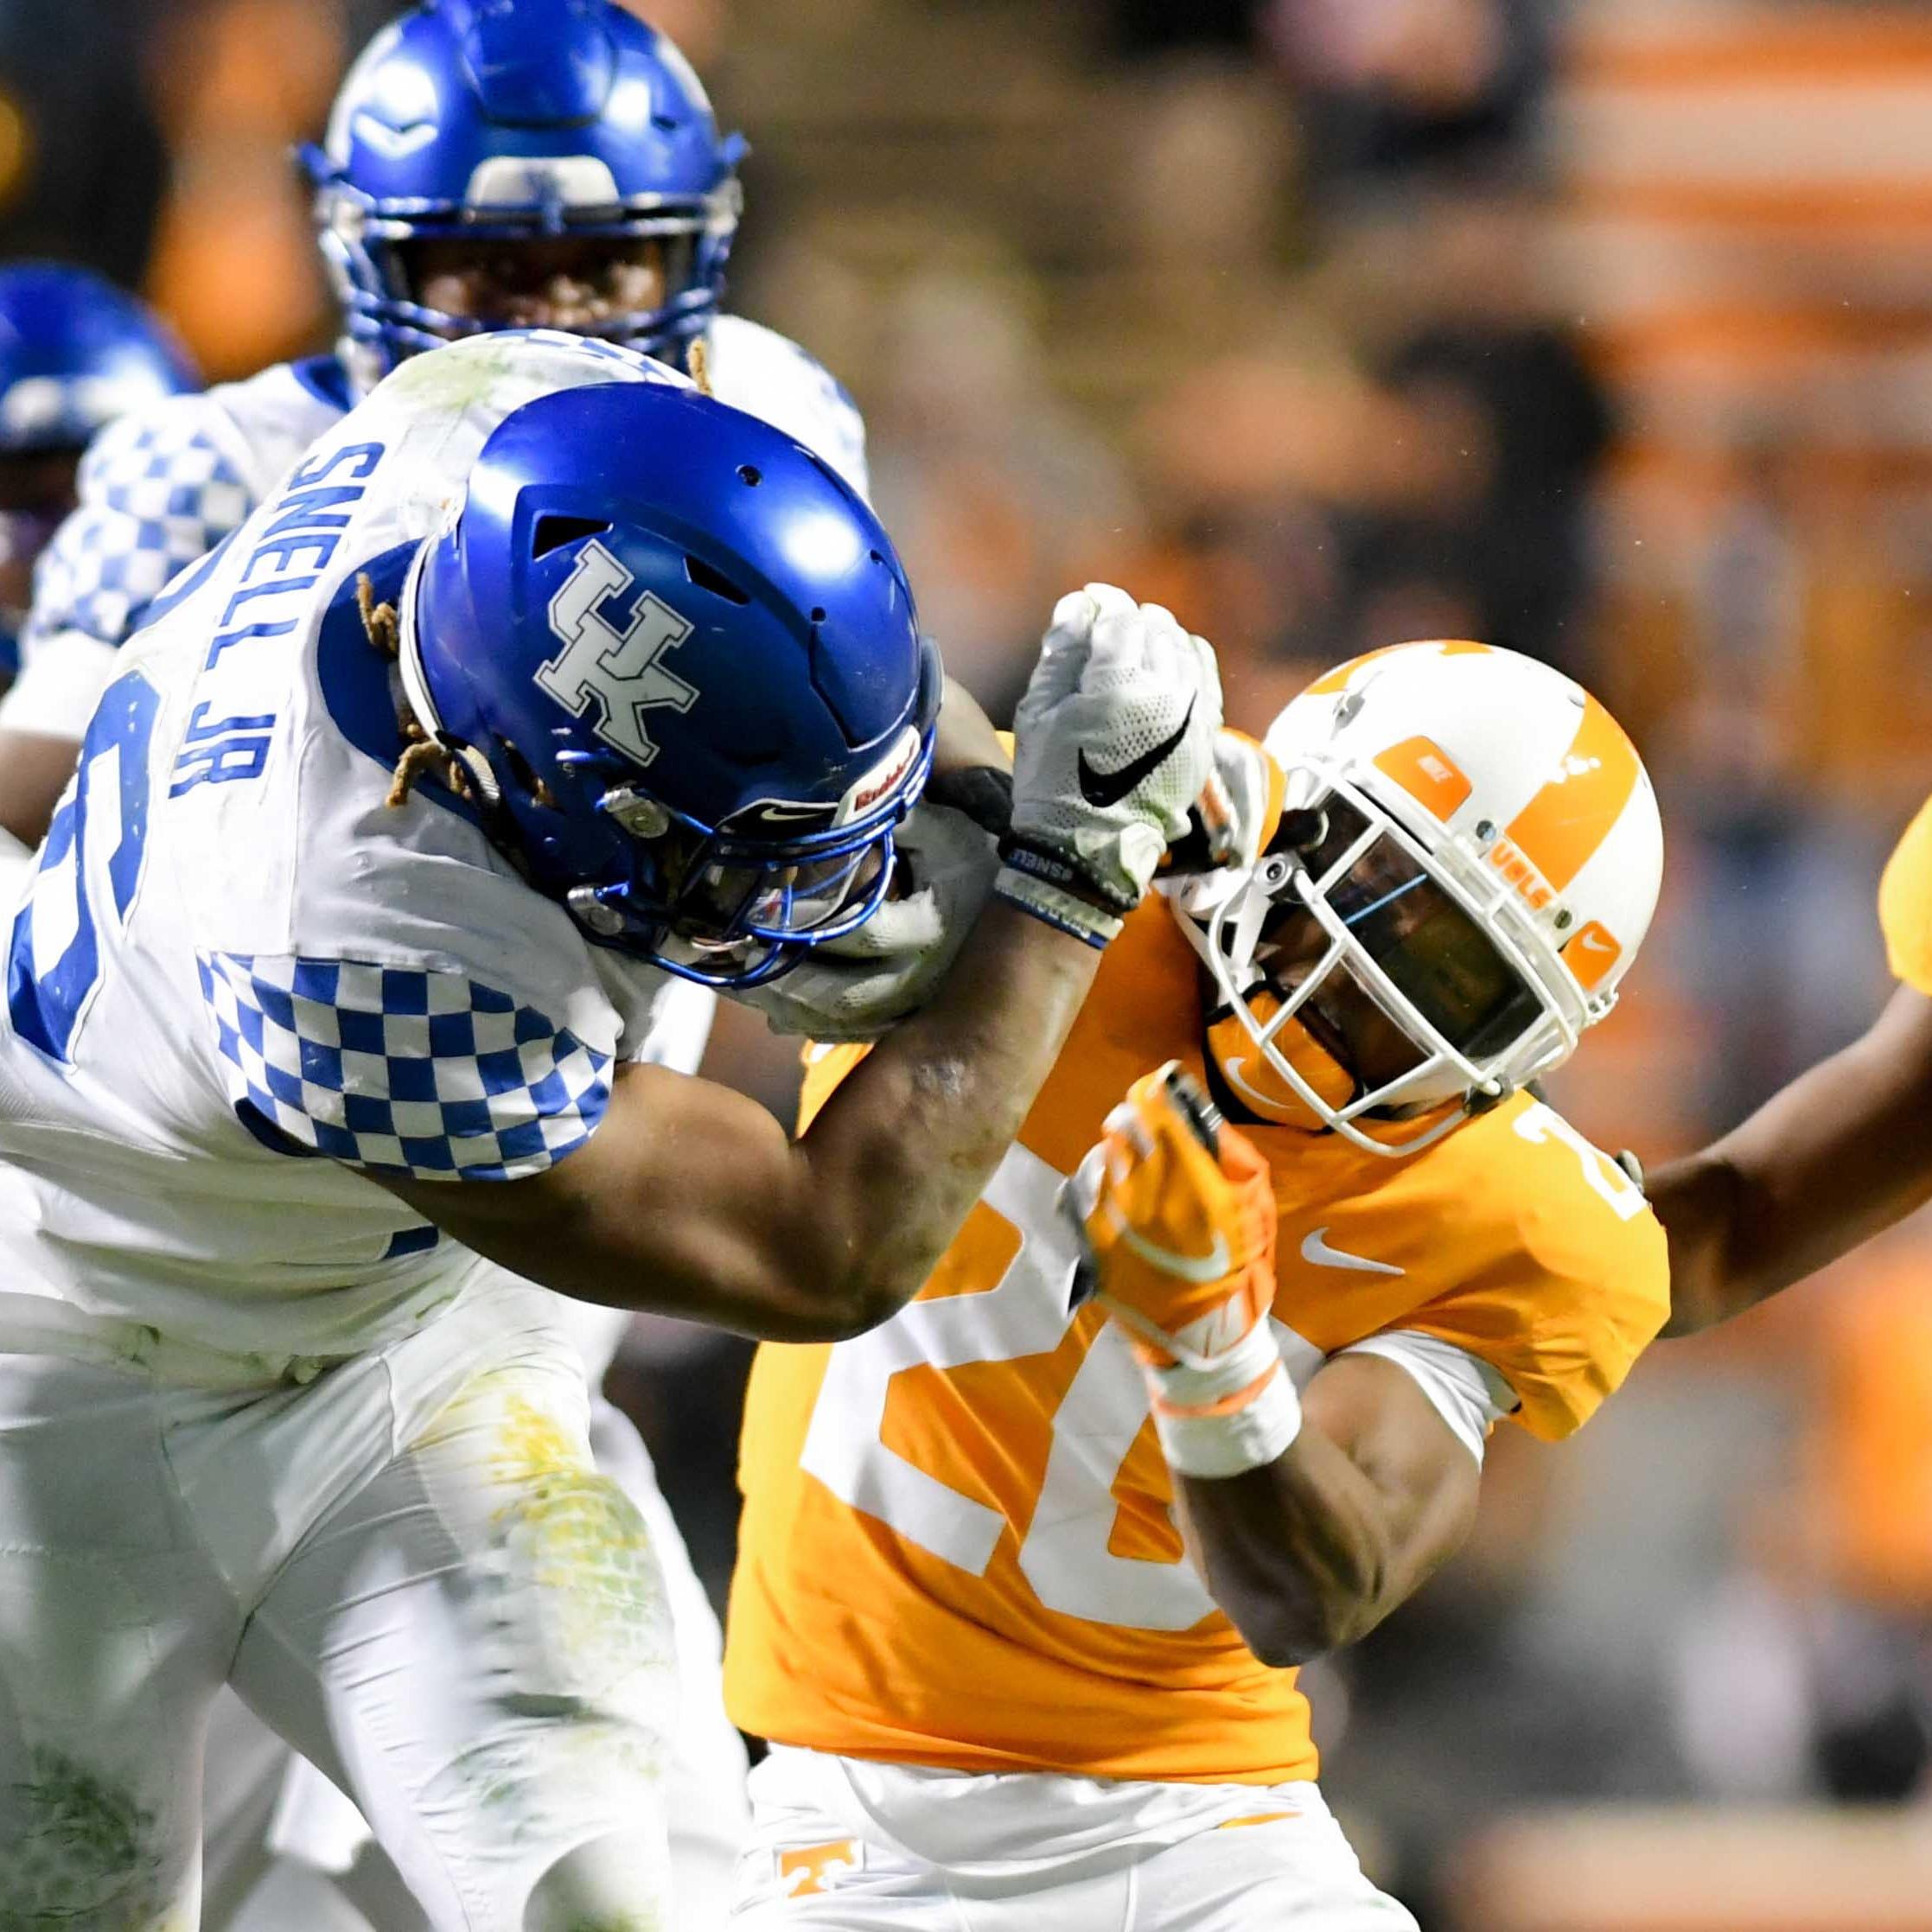 SEC Rewind Week 11: LSU, Florida win and don't make bettors happy